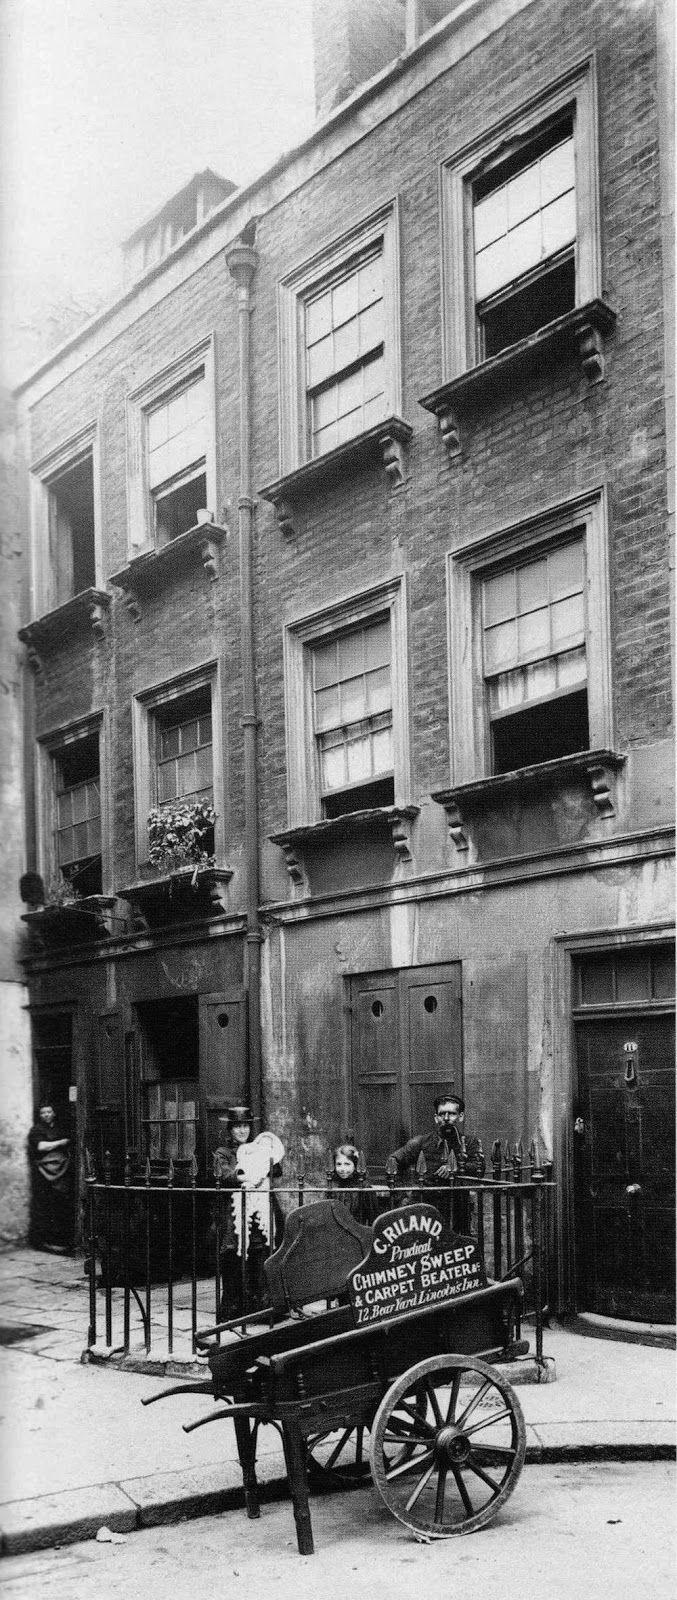 Philip-Davies-Panoramas-of-Lost-London-16